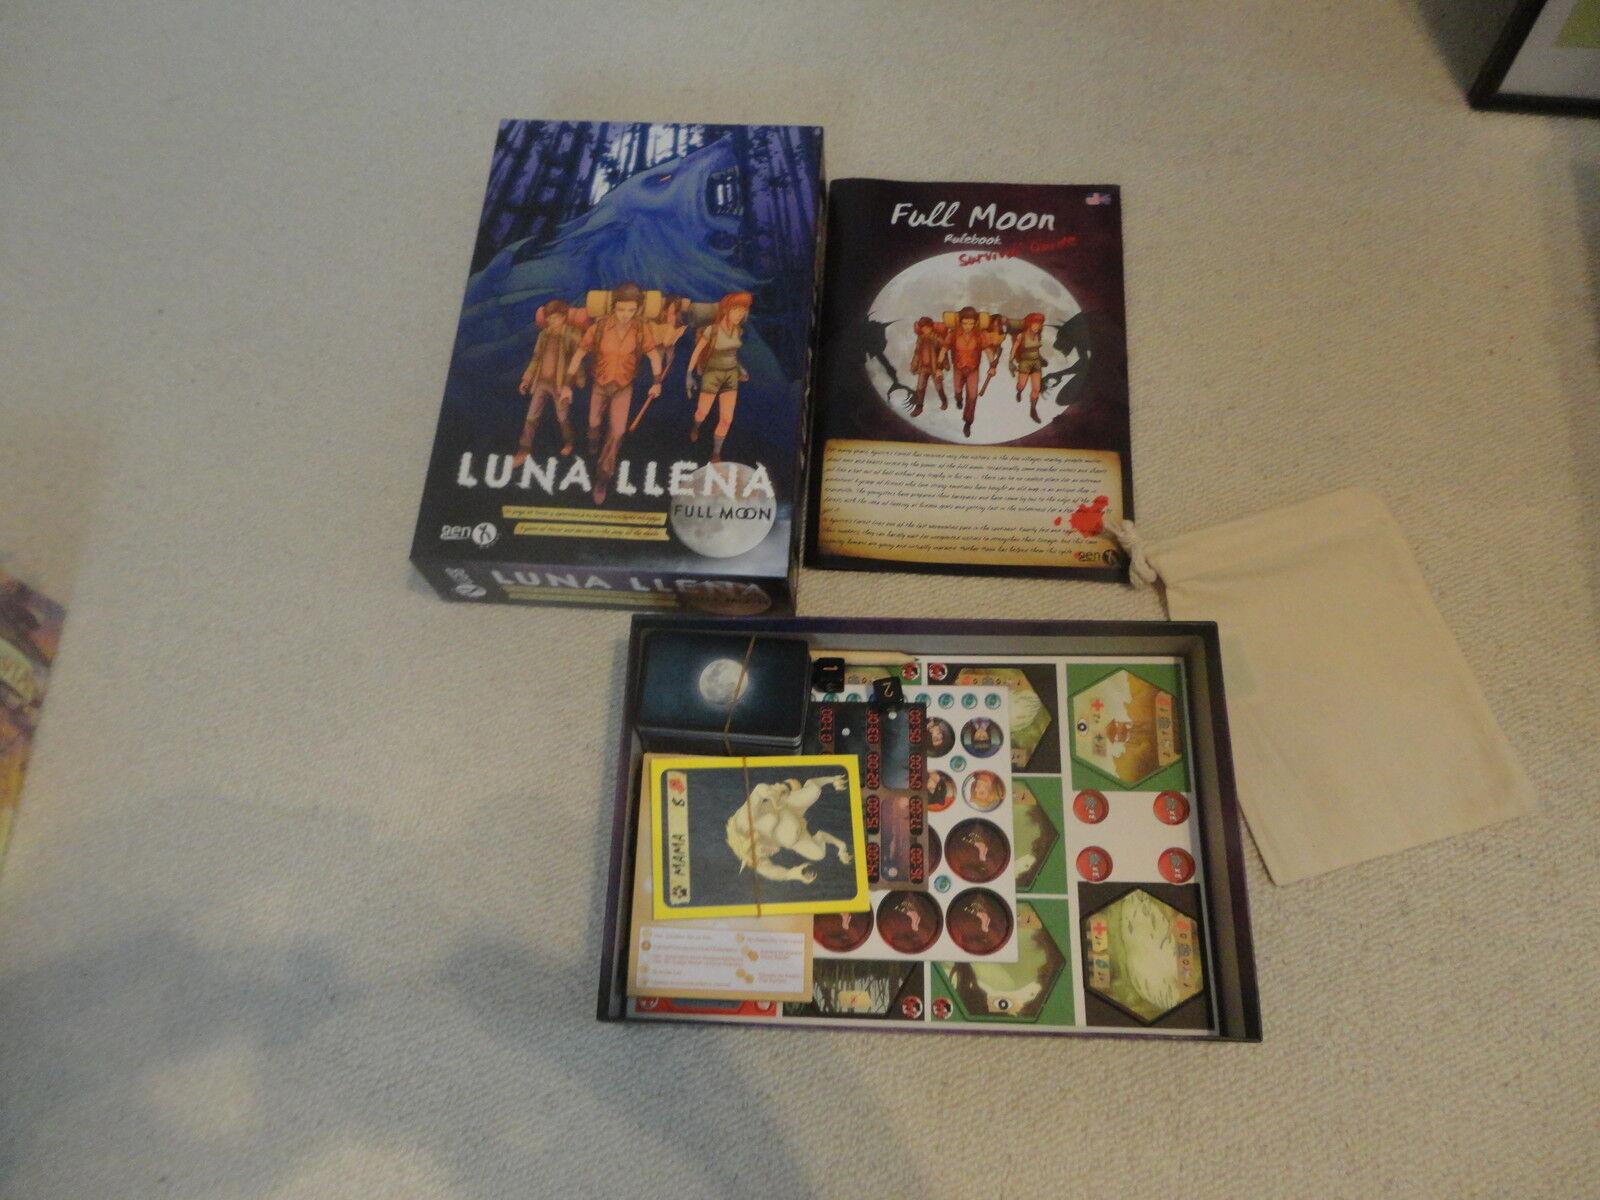 Luna Llena - Full Moon (Gen X Games 2009) Neu    Stilvoll und lustig